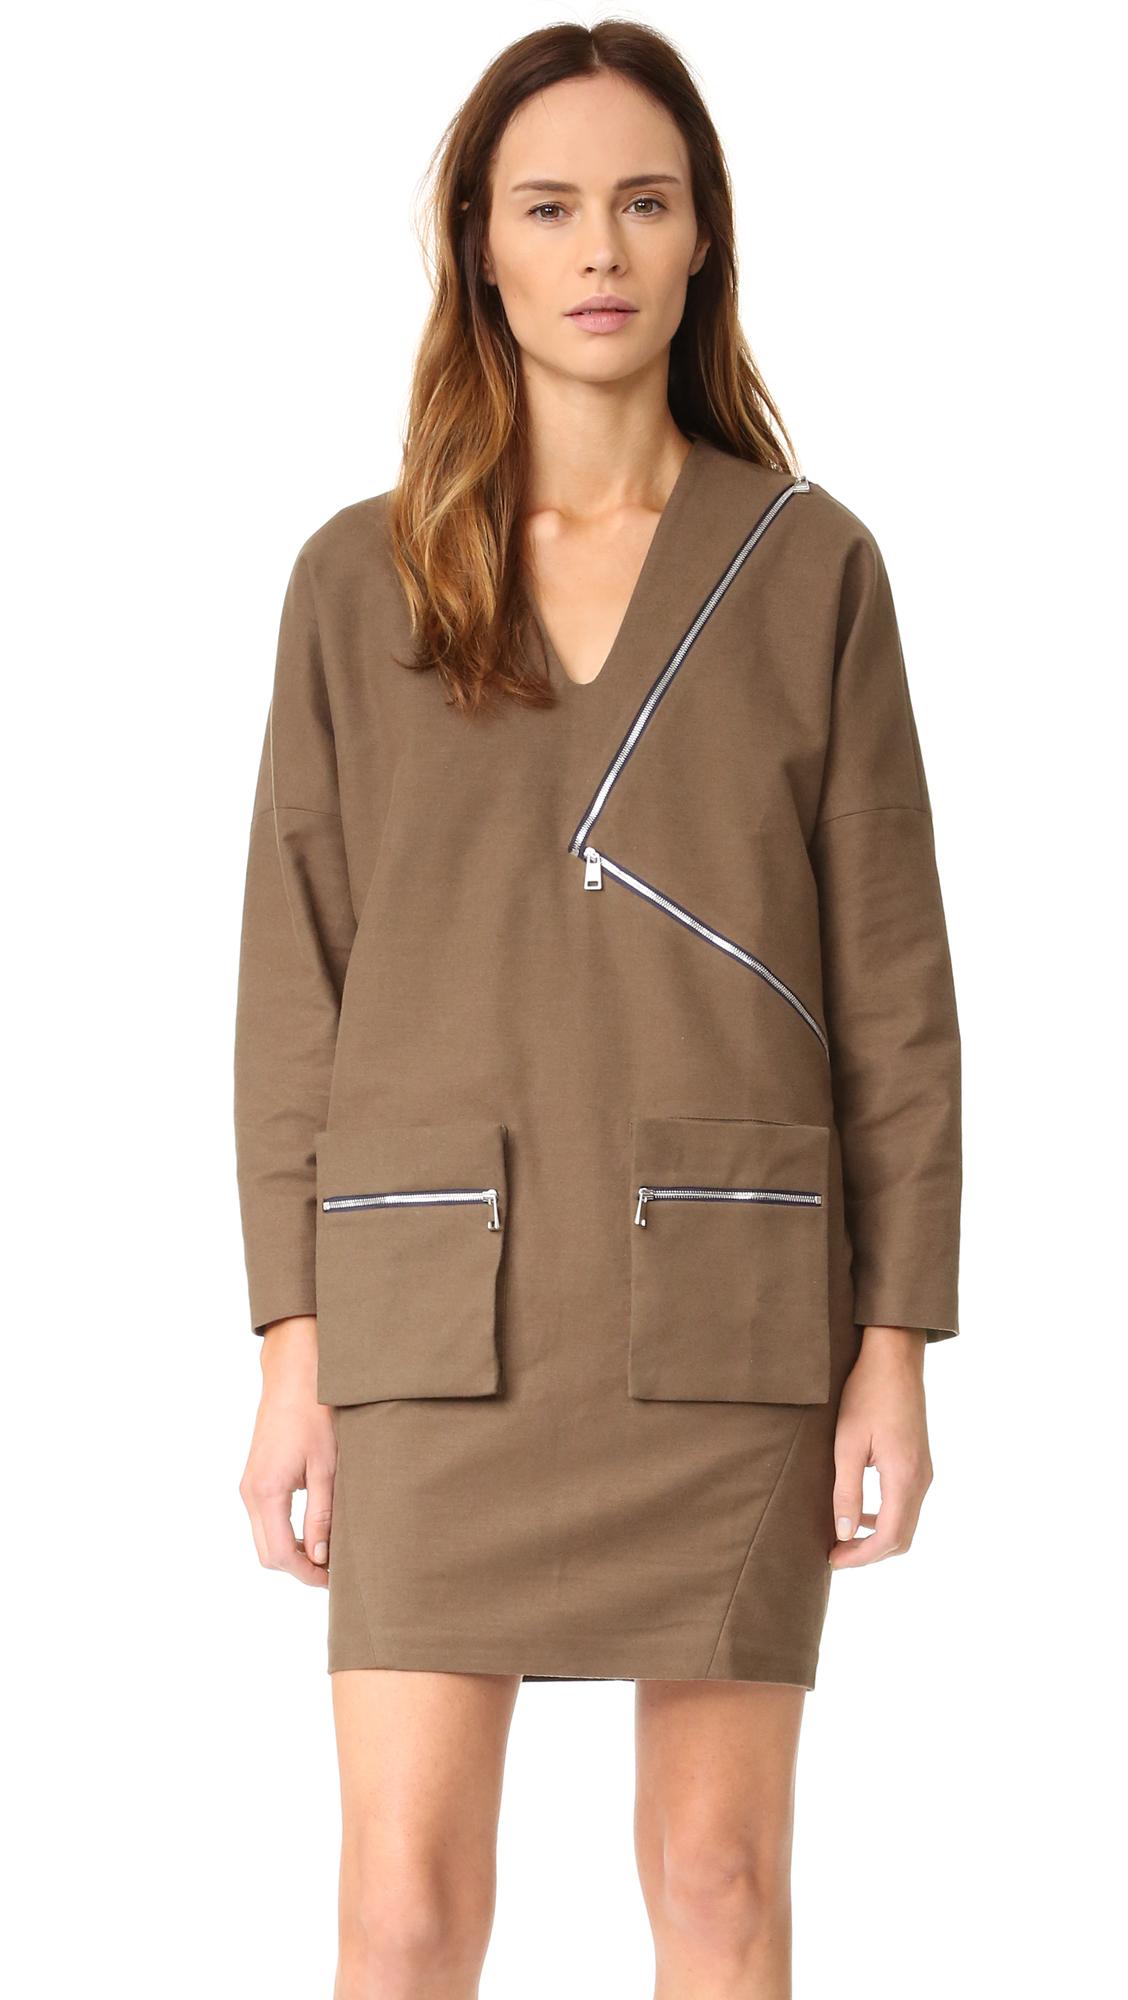 Aeron Zip Long Sleeve Dress - Dark Olive Green at Shopbop